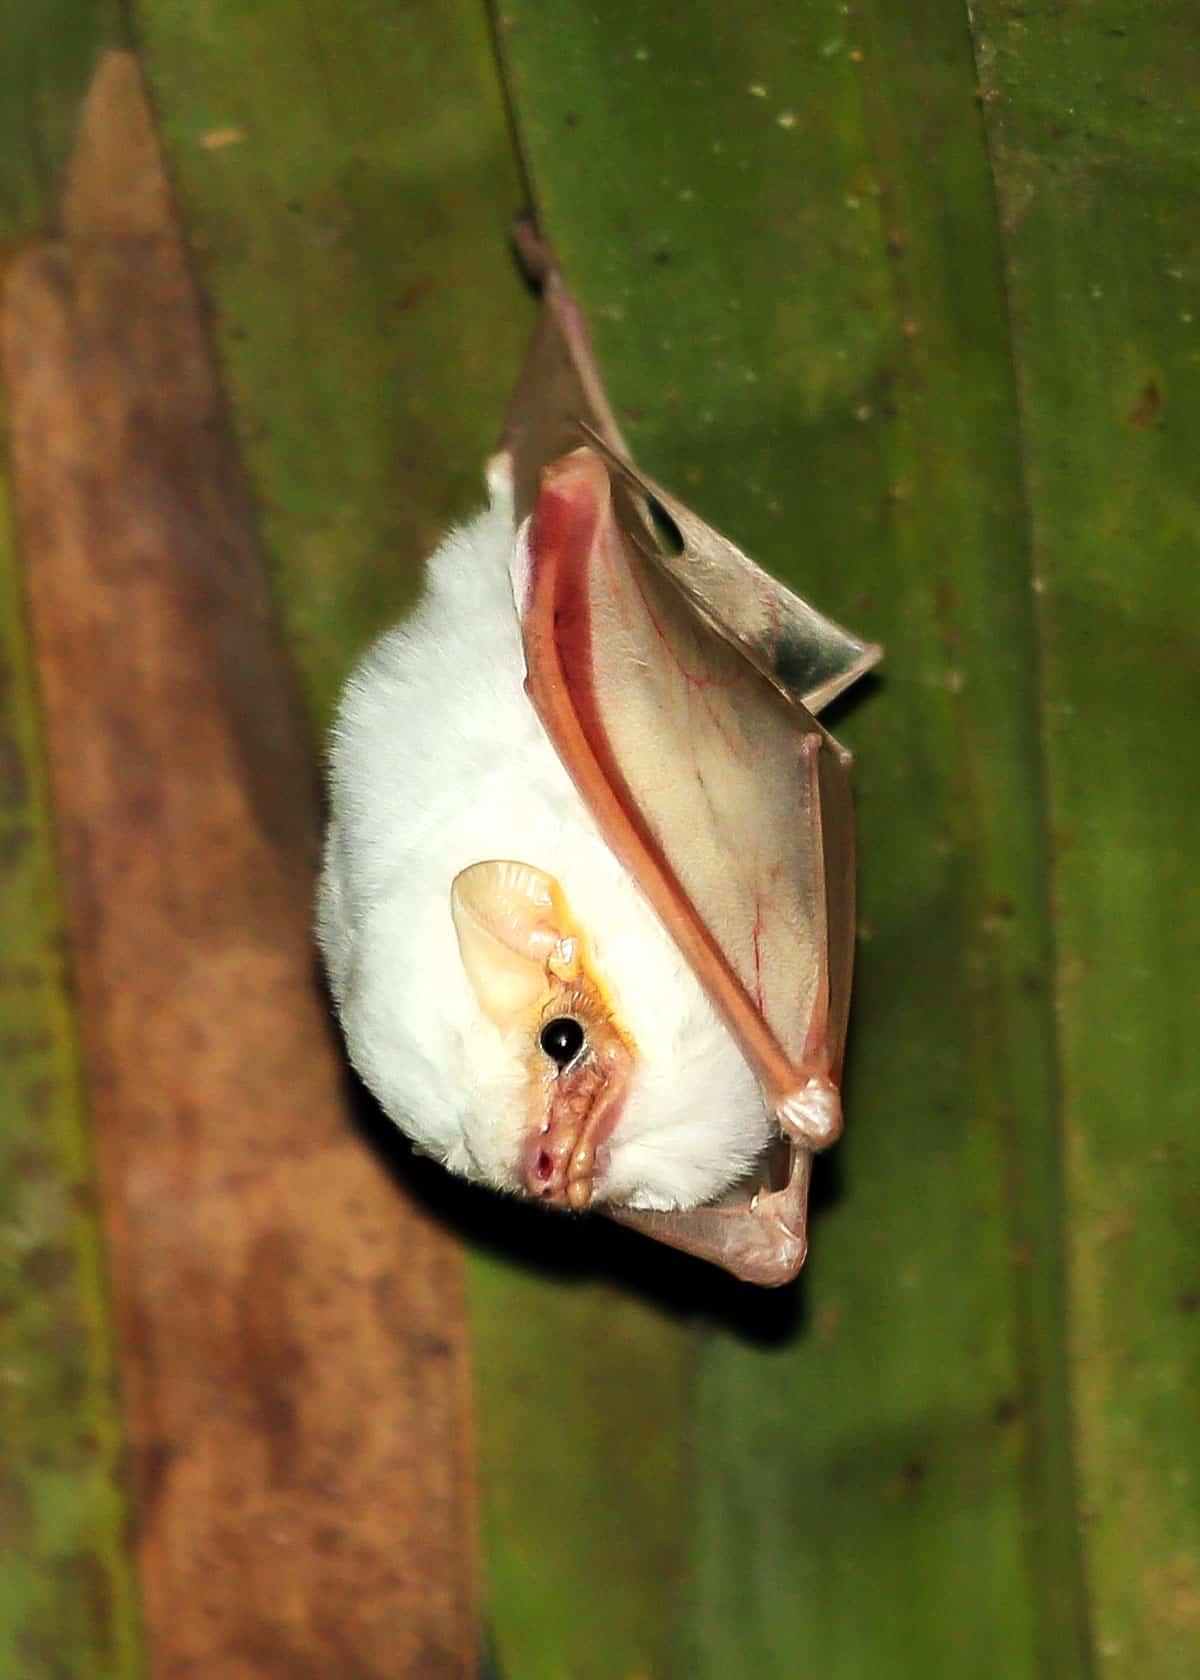 Adorable white bat